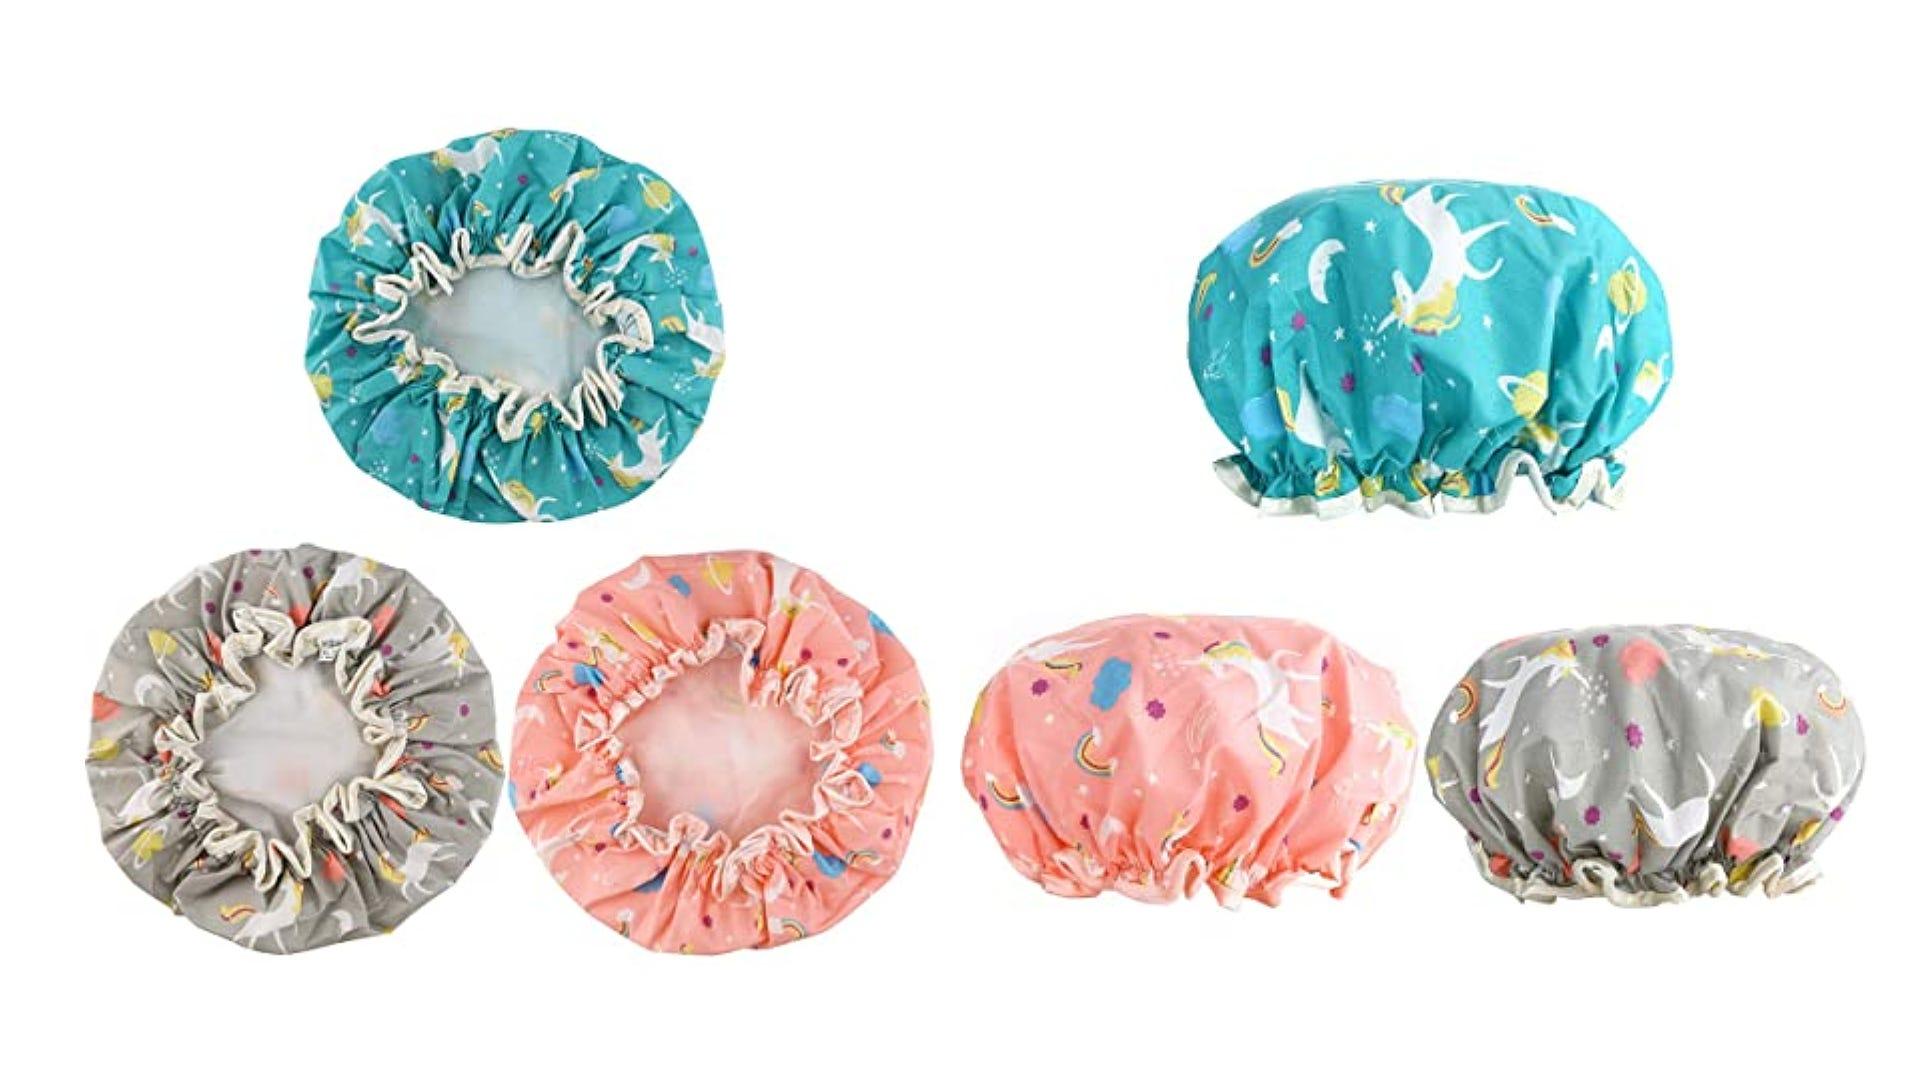 dual vies elastic bottom and side three unicorn printed shower caps. blue, pink, gray